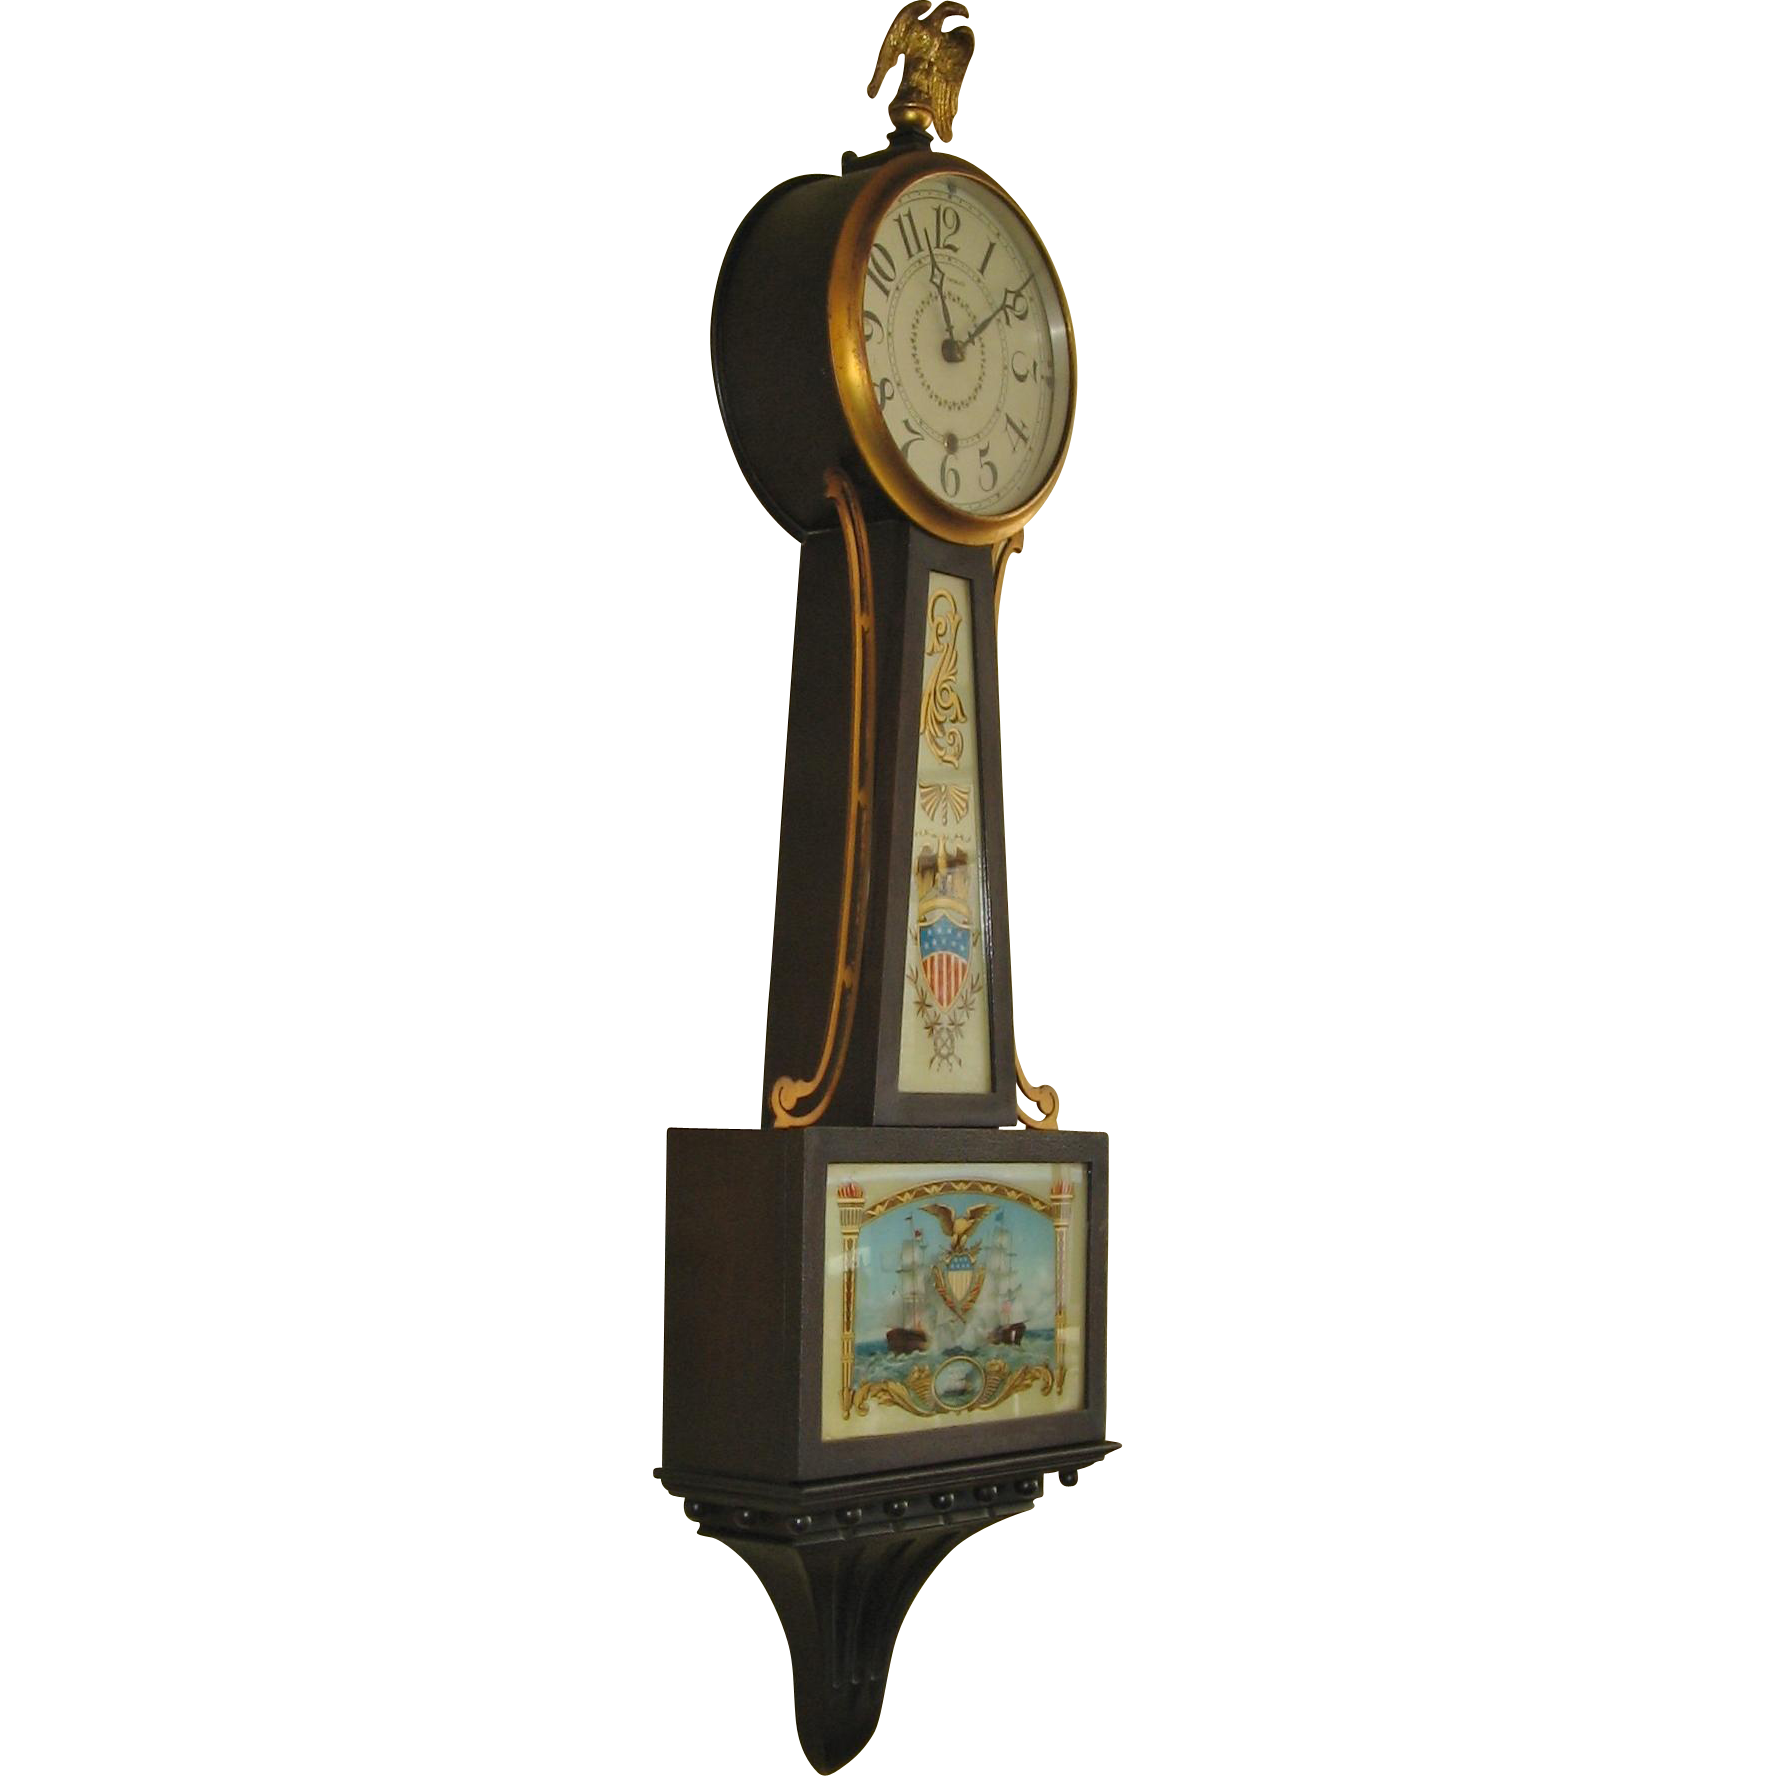 Seth Thomas Banjo Clock 1 Www Rubylane Com Vintagebeginshere Vintage Clock Clock Antique Wall Clock